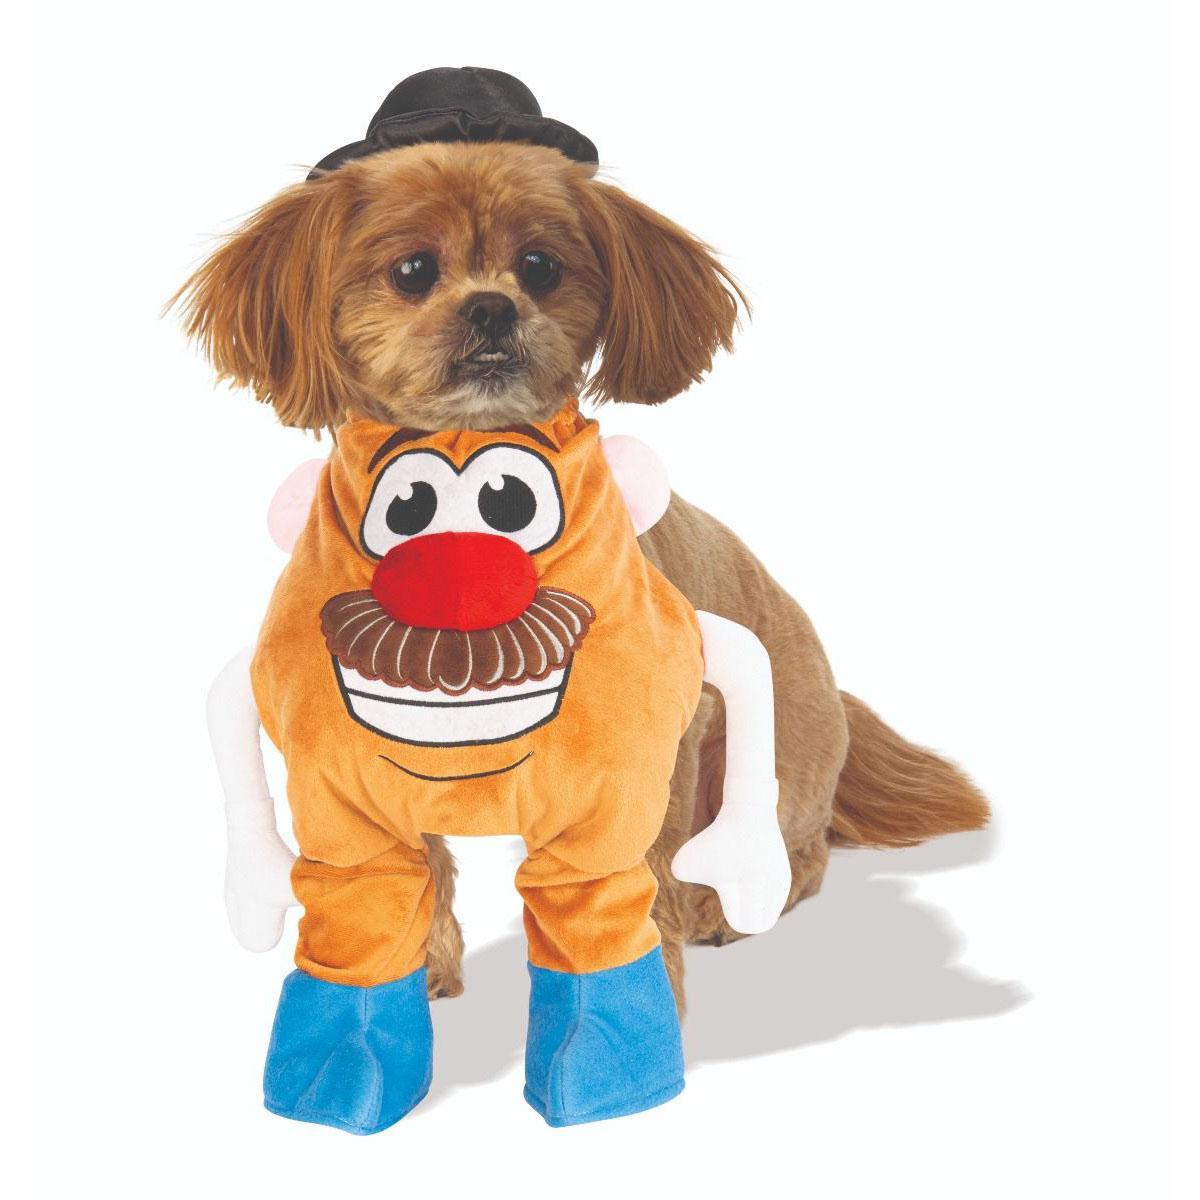 Walking Mr. Potato Head Dog Costume by Rubie's